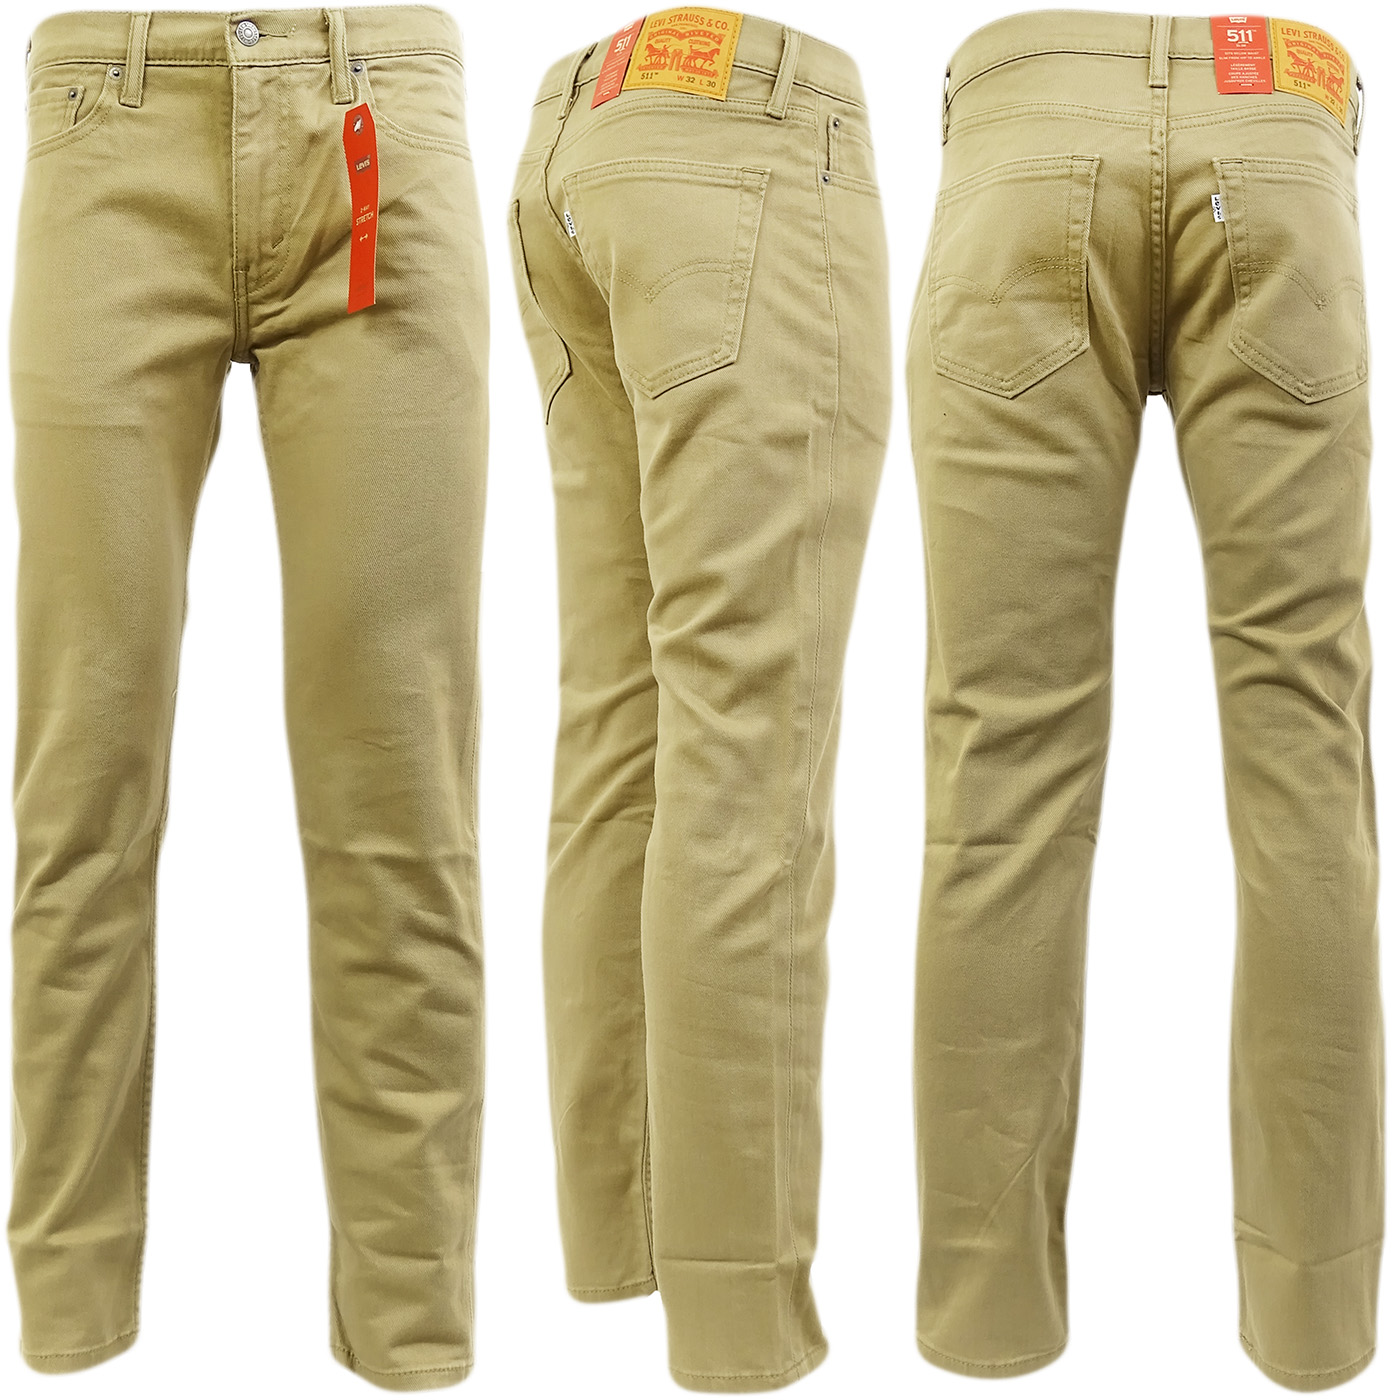 Strauss 44Ebay Levi 511 Leg Slim Beige Jean 22 UjMLzpSVGq